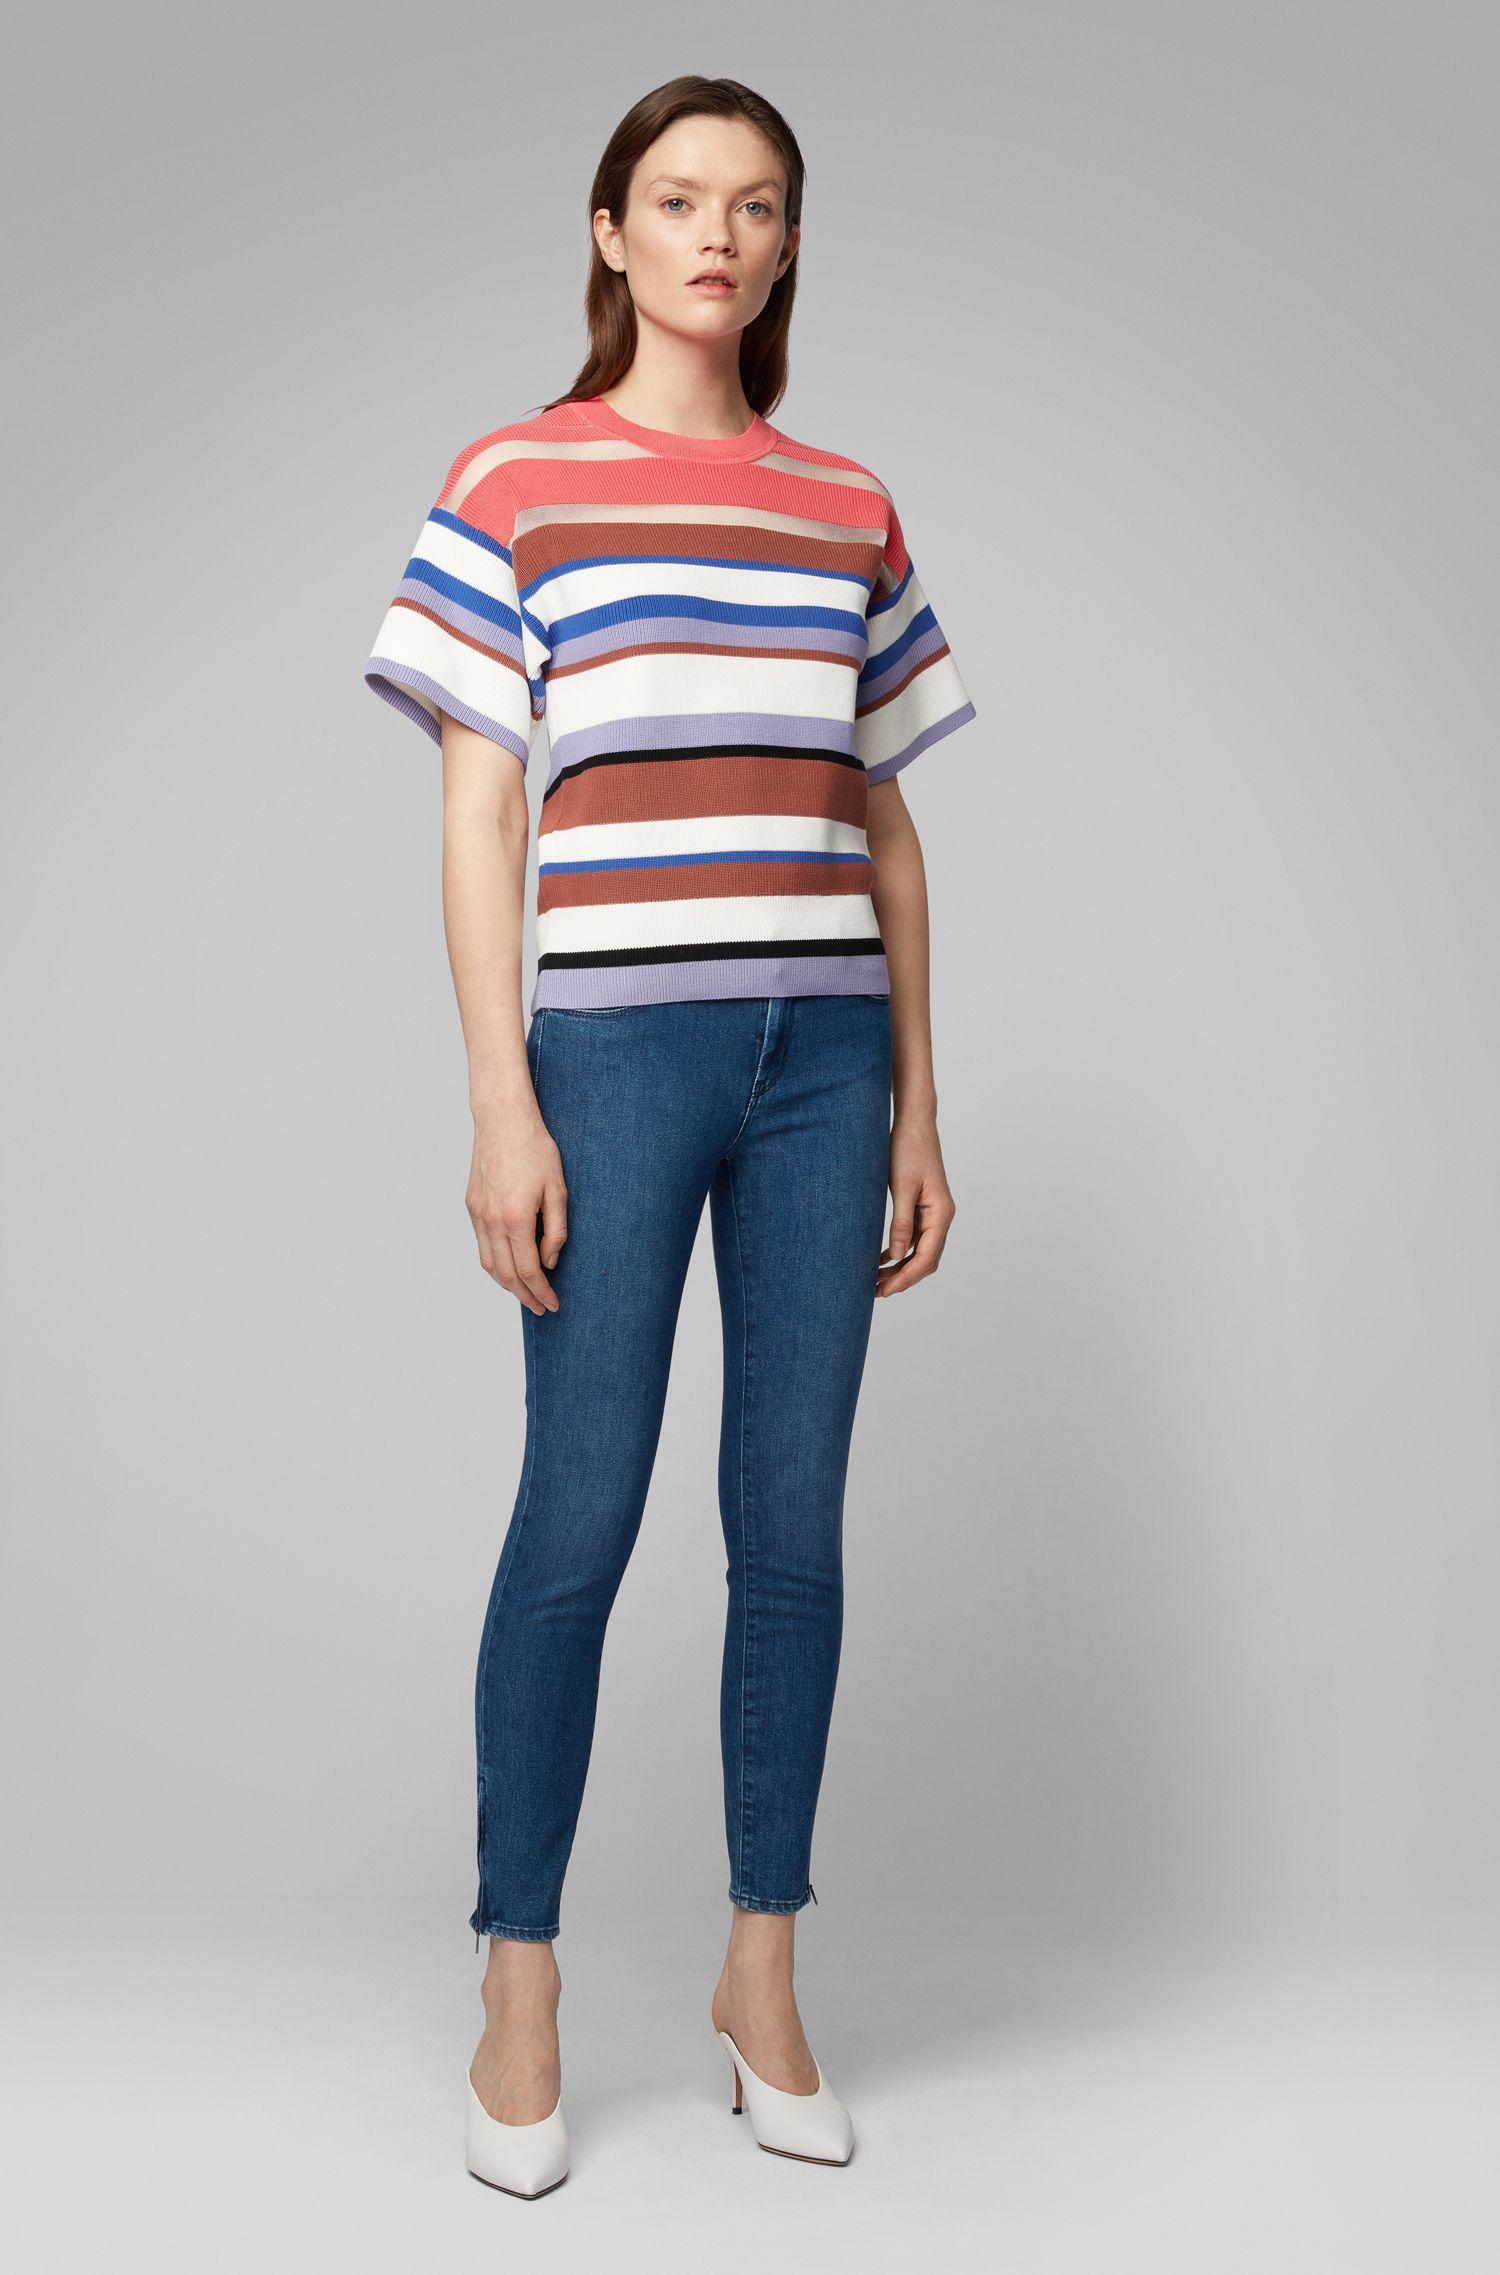 Hugo Boss - Skinny-Fit Jeans aus komfortablem Stretch-Denim - 2